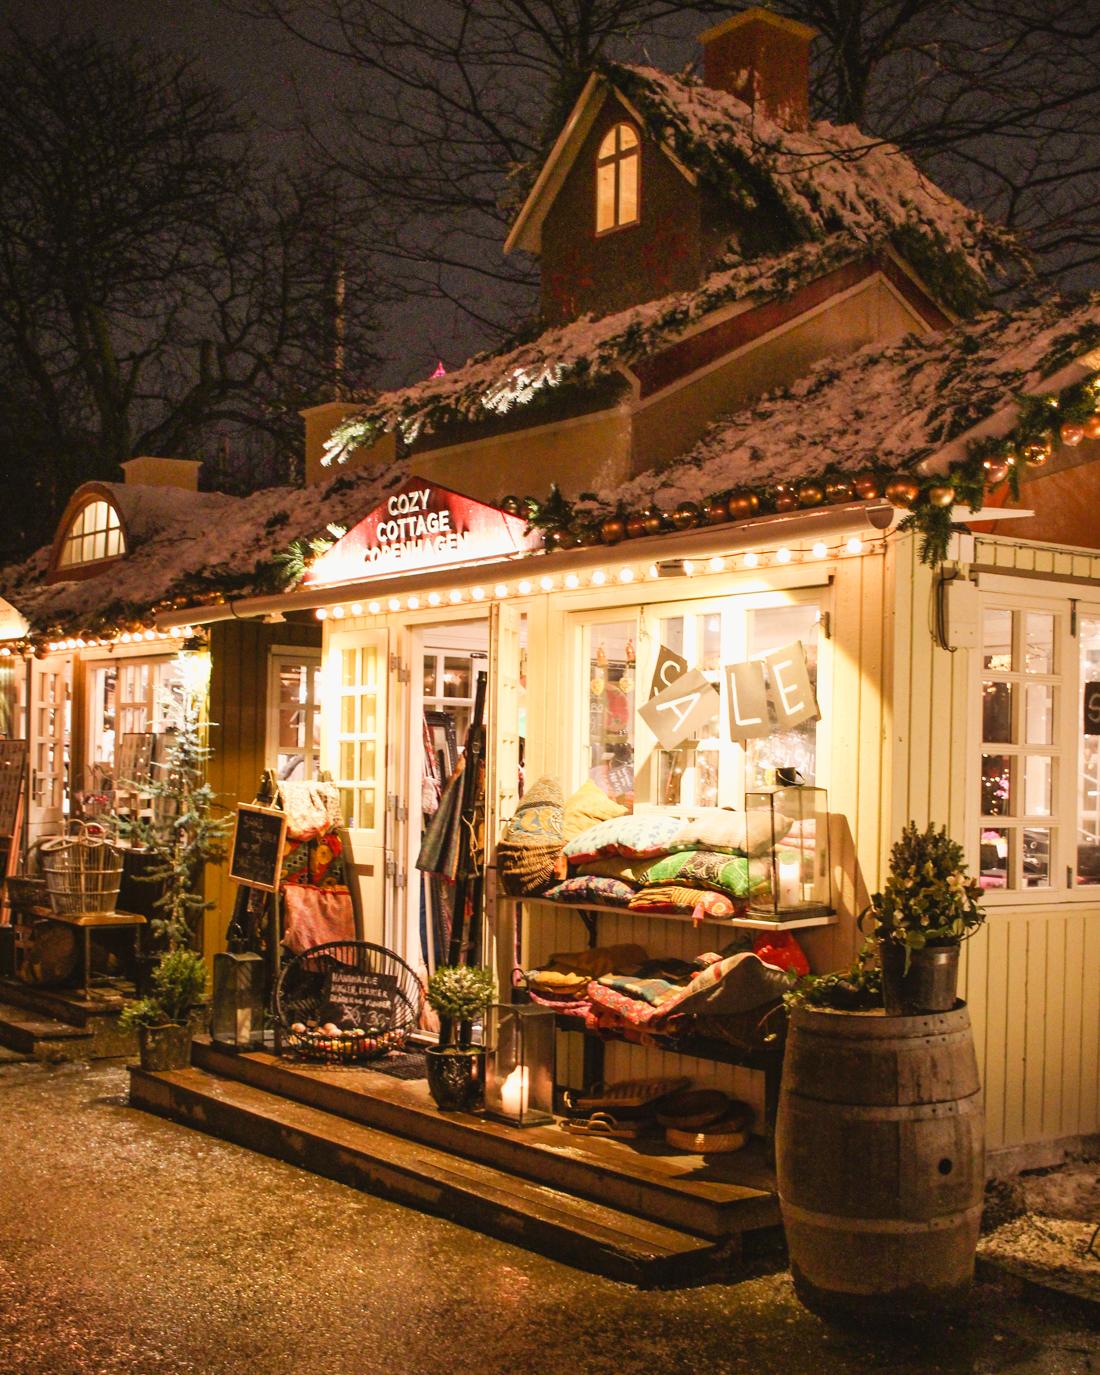 Christmas Market in Tivoli Garden, Copenhagen-4